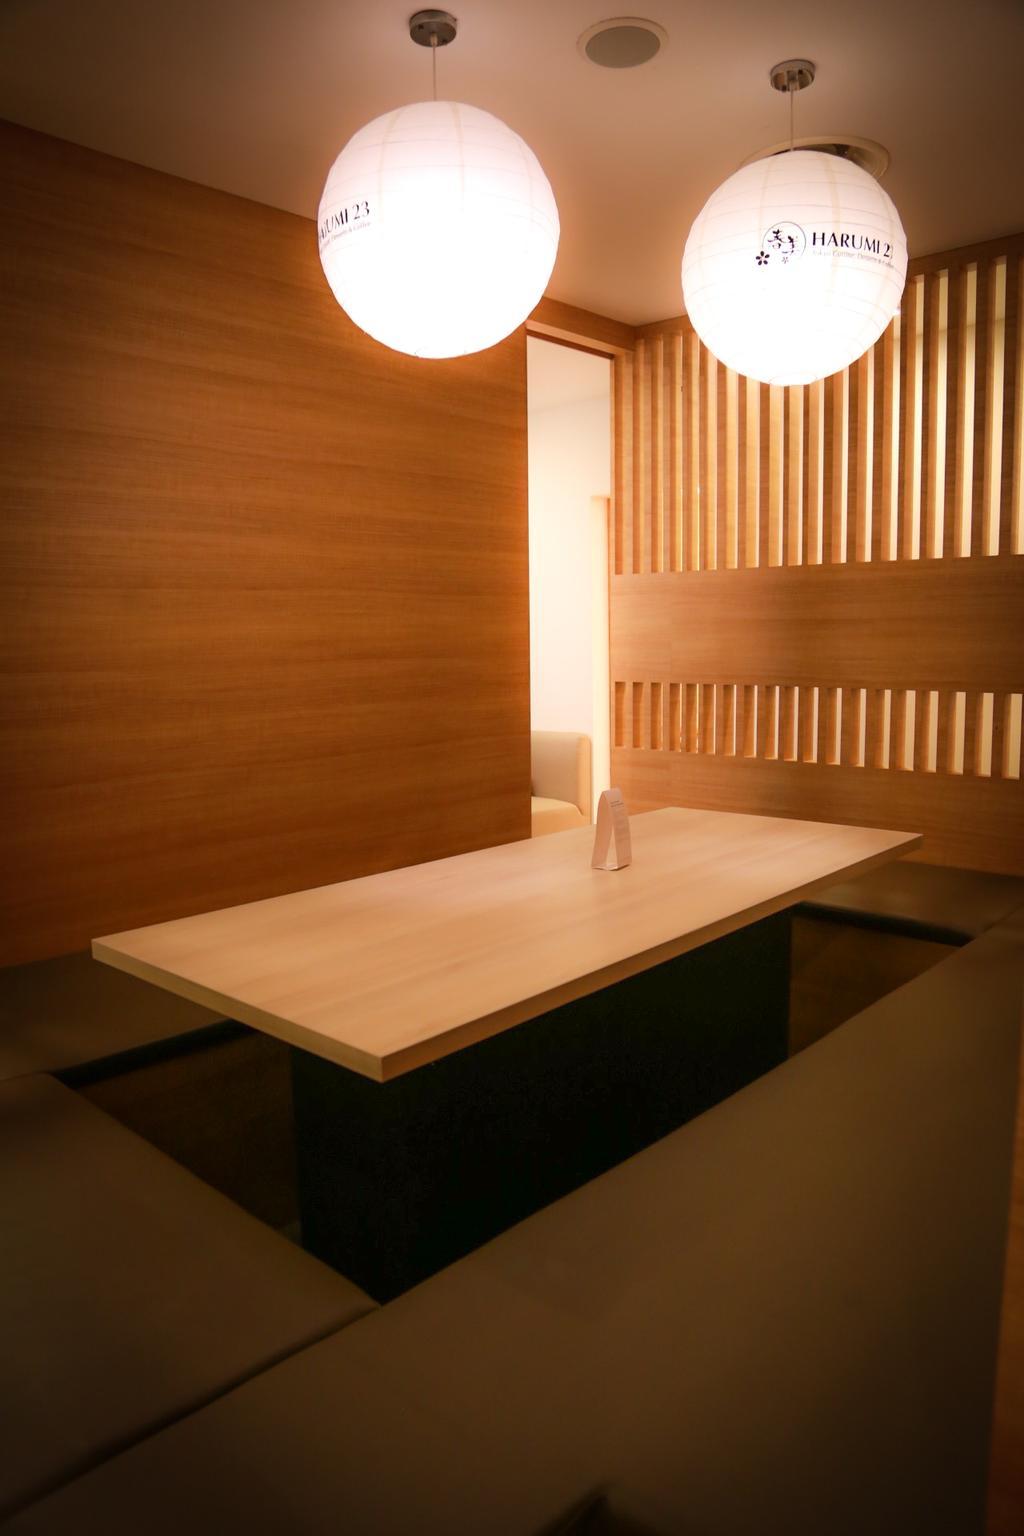 Harumi 23, Commercial, Interior Designer, Lequen Construction And Renovation Group